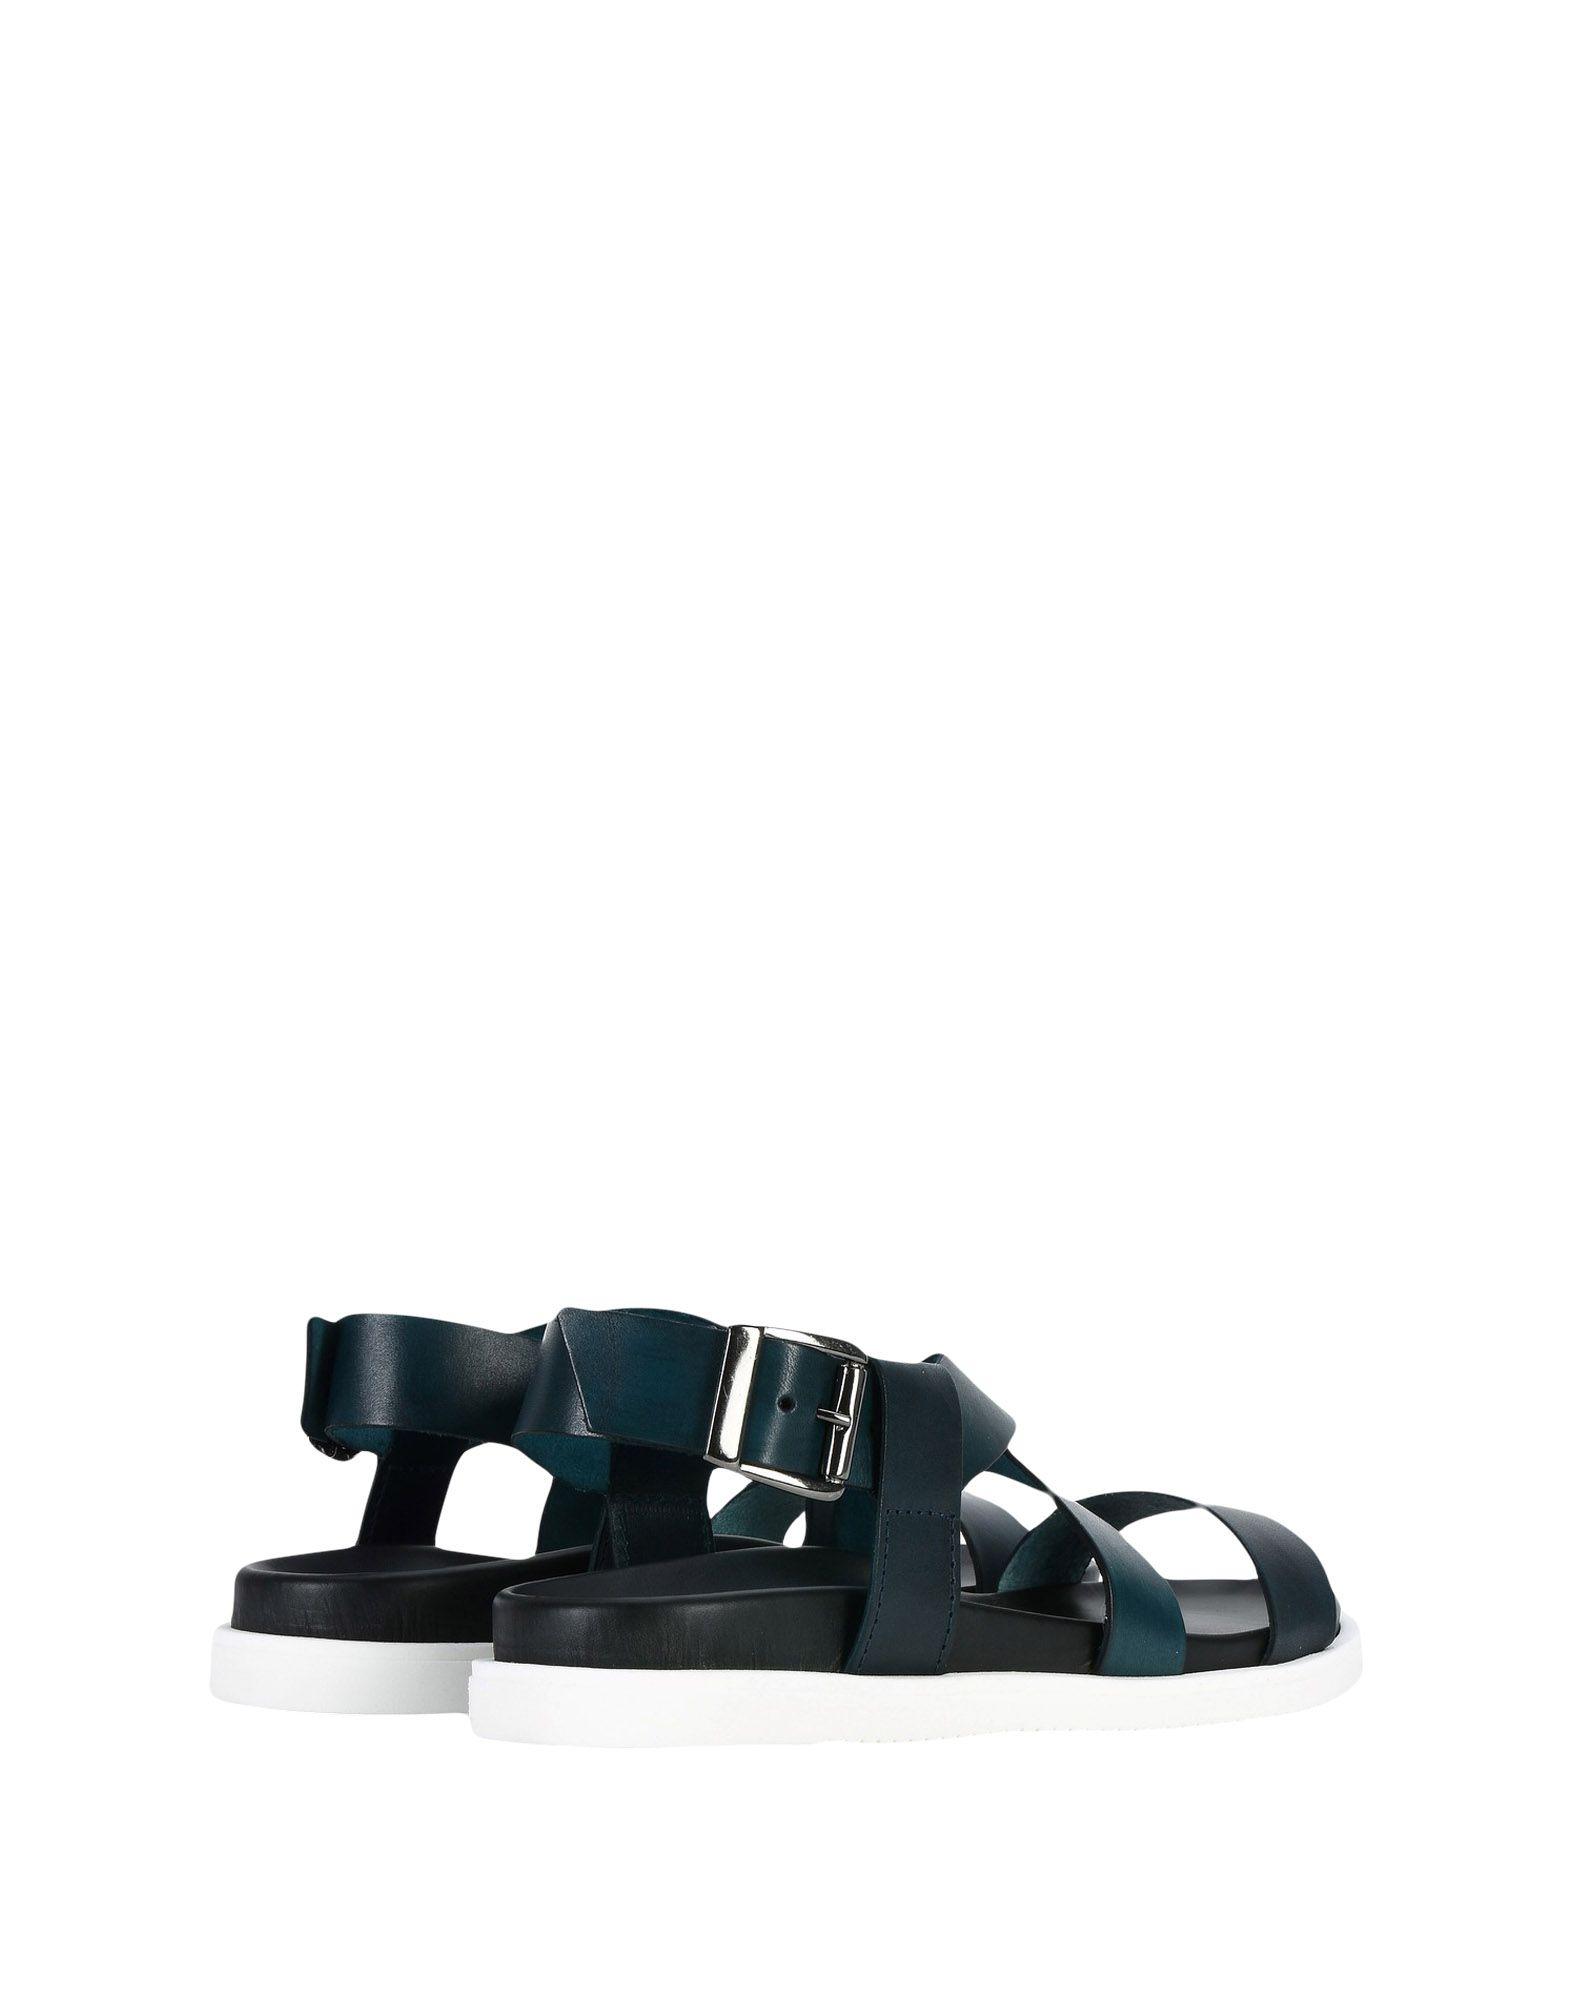 8 Sandalen 11466387PW Herren  11466387PW Sandalen Heiße Schuhe 608120